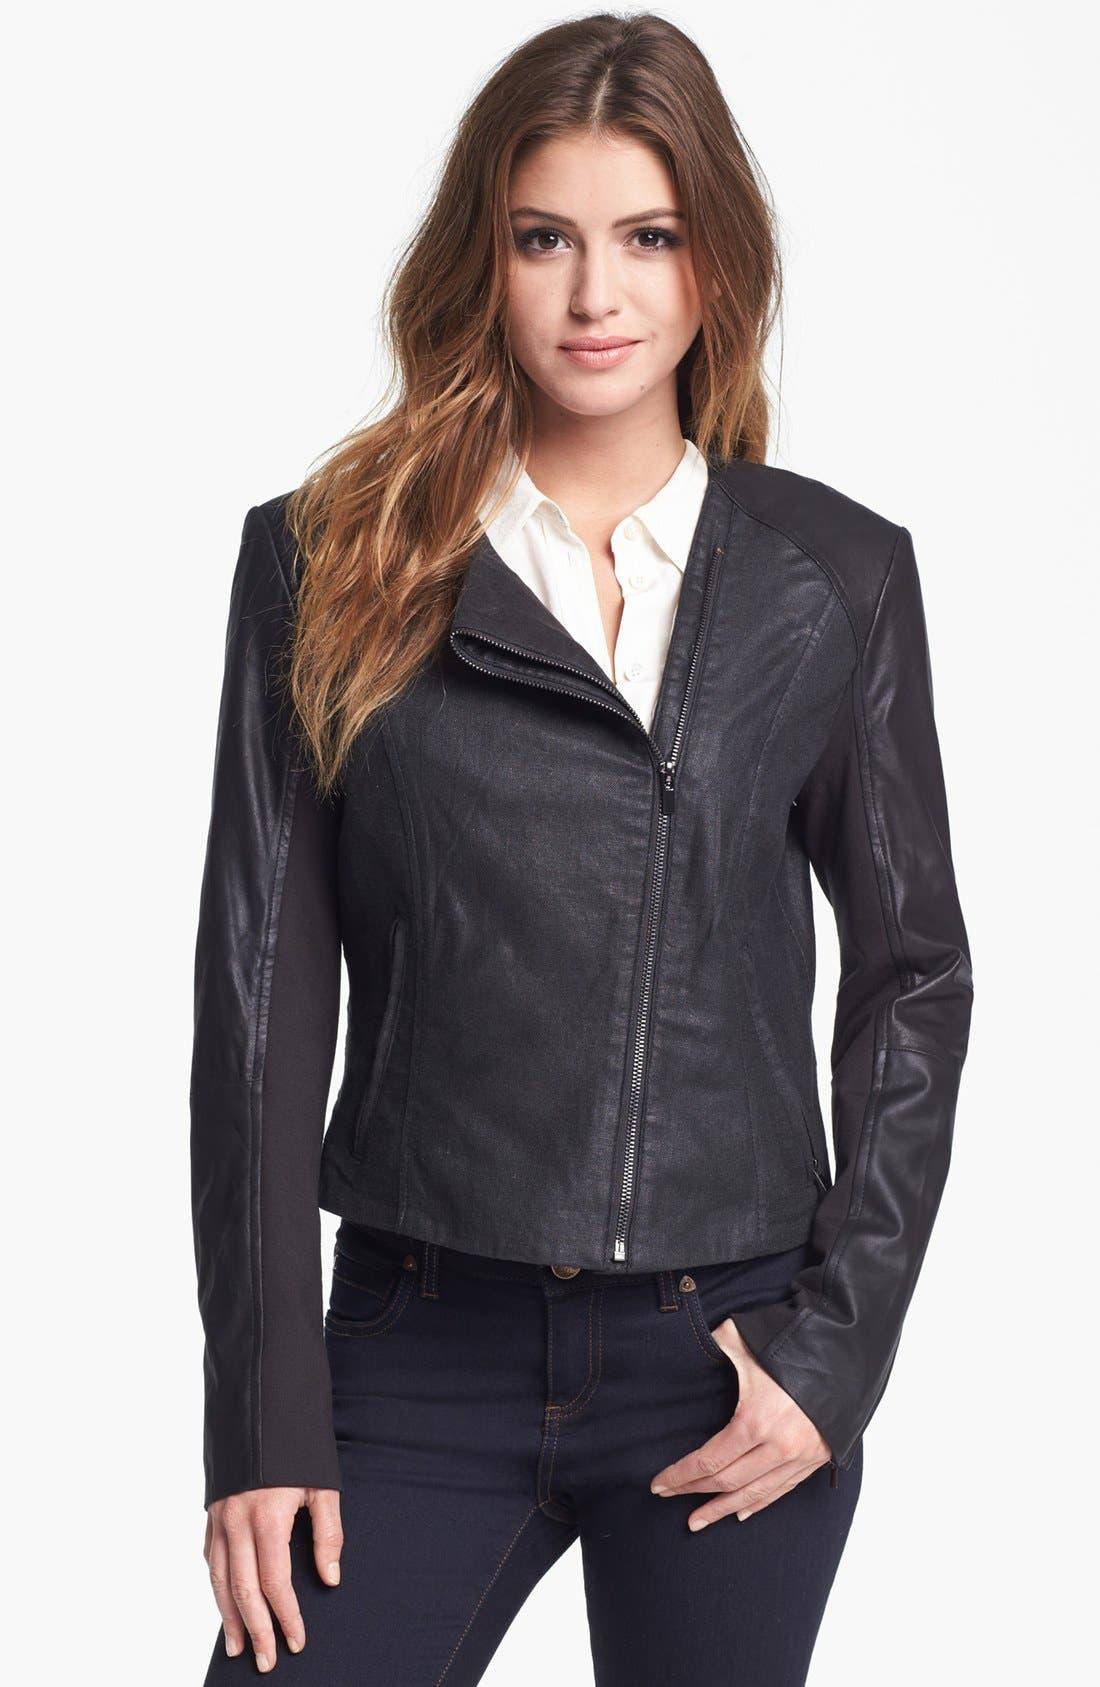 Main Image - LaMarque Coated Moto Jacket with Leather Sleeves